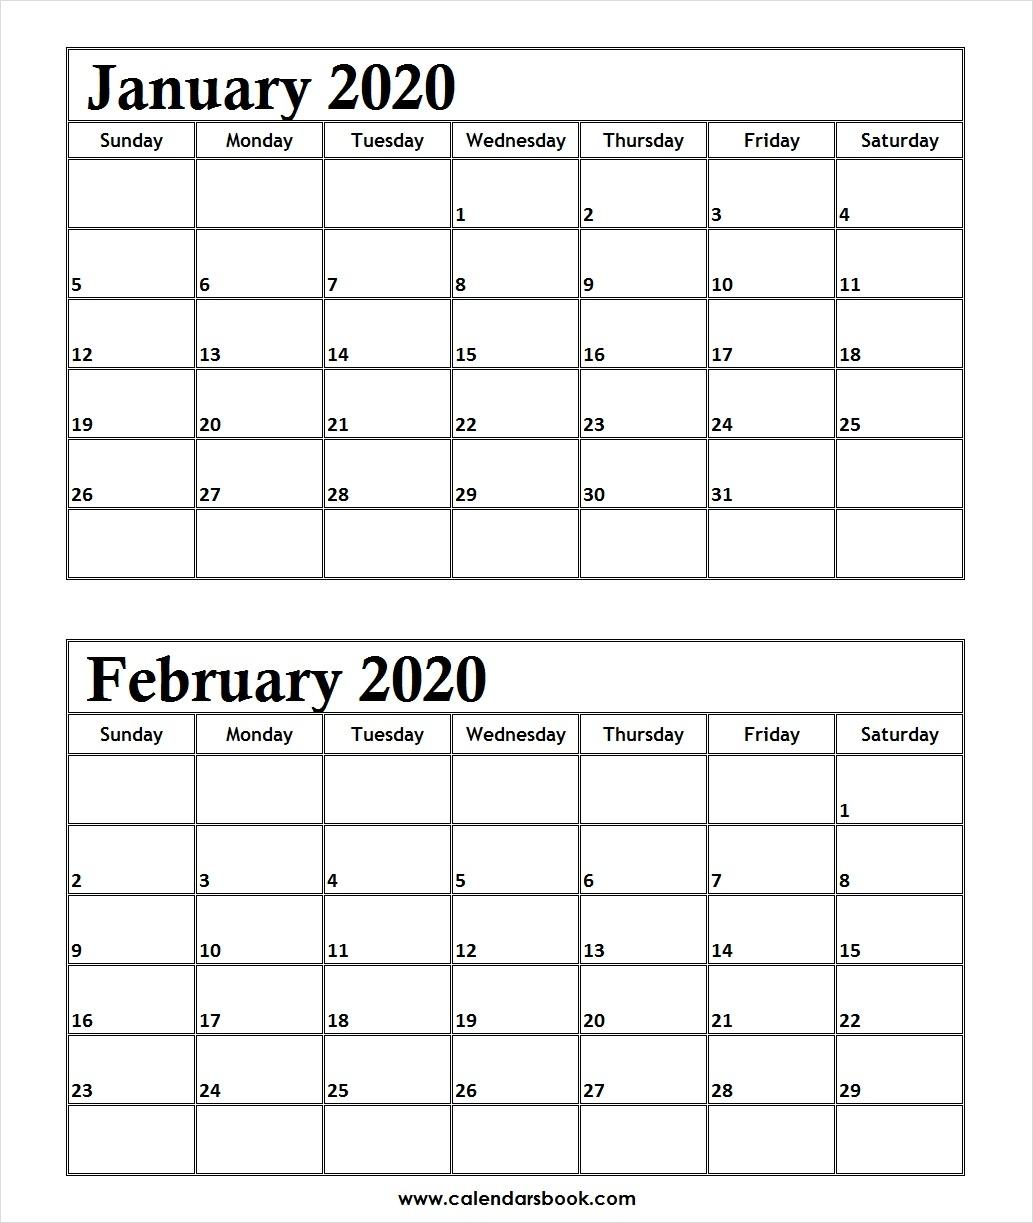 February 2020 Calendar Tumblr